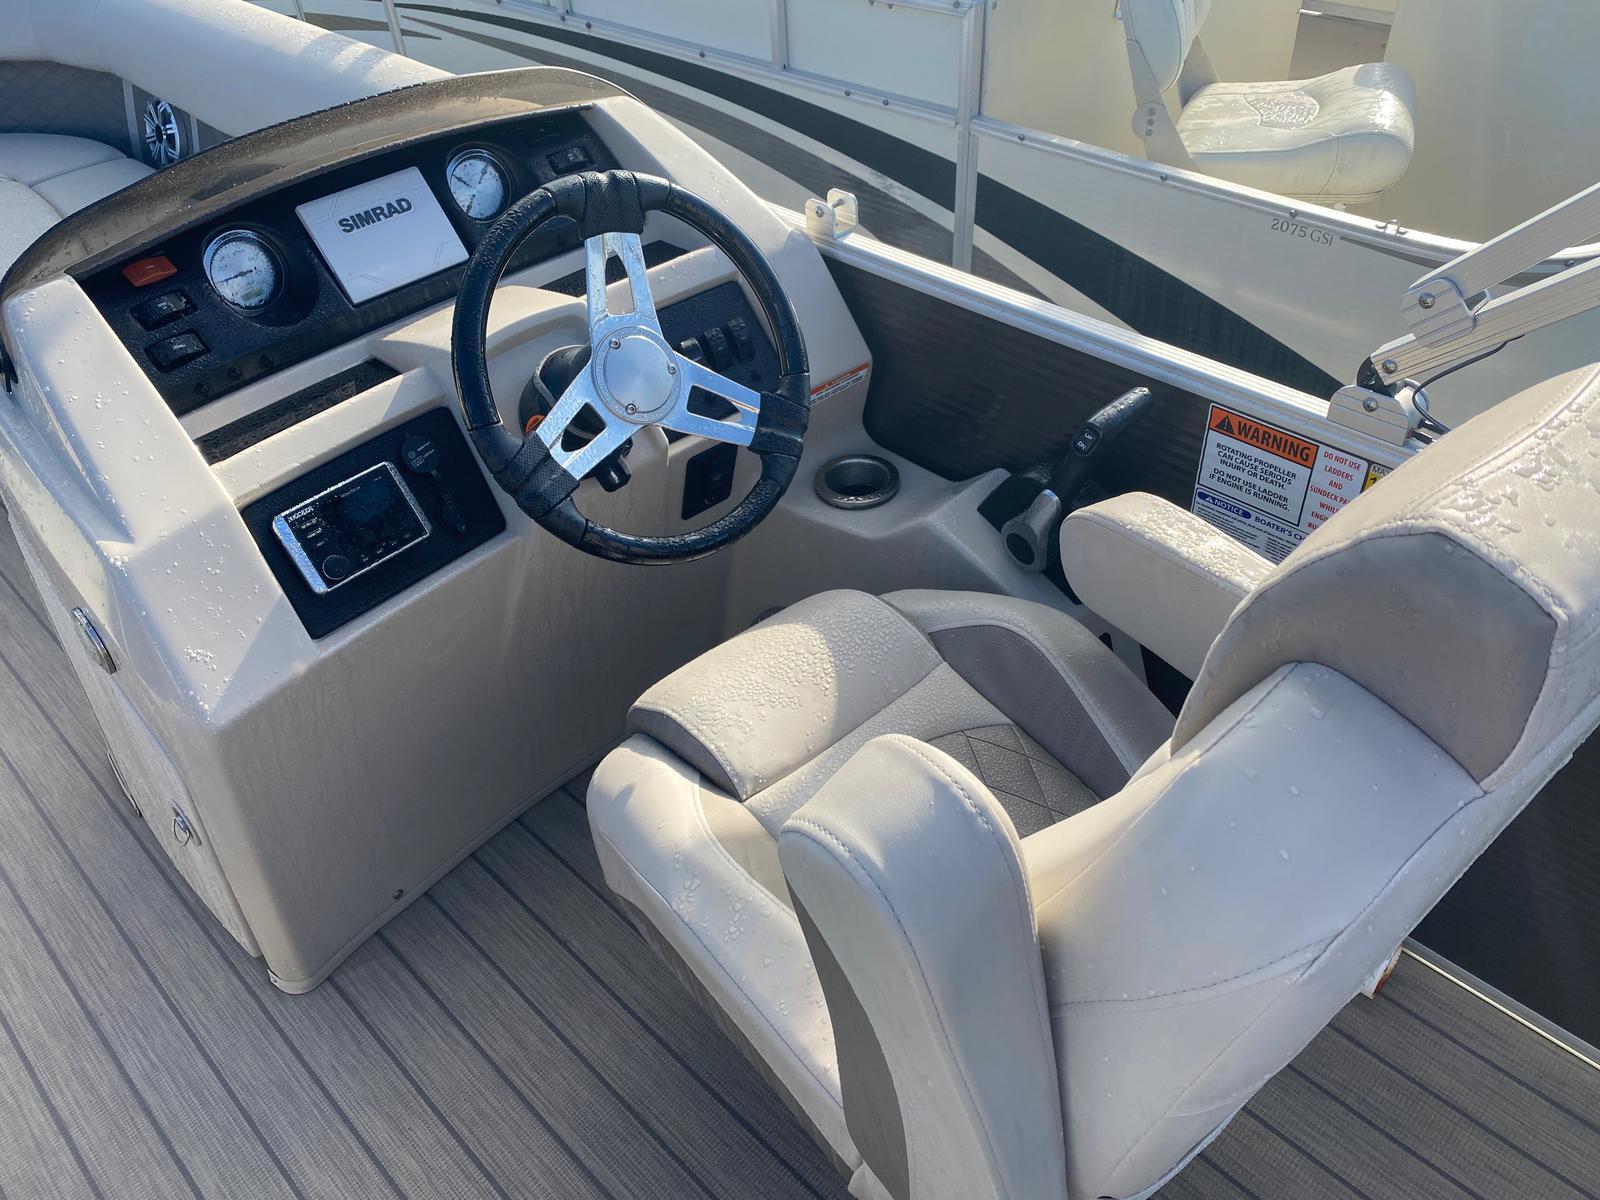 2018 Bennington boat for sale, model of the boat is 22 SSX Pontoon & Image # 10 of 13